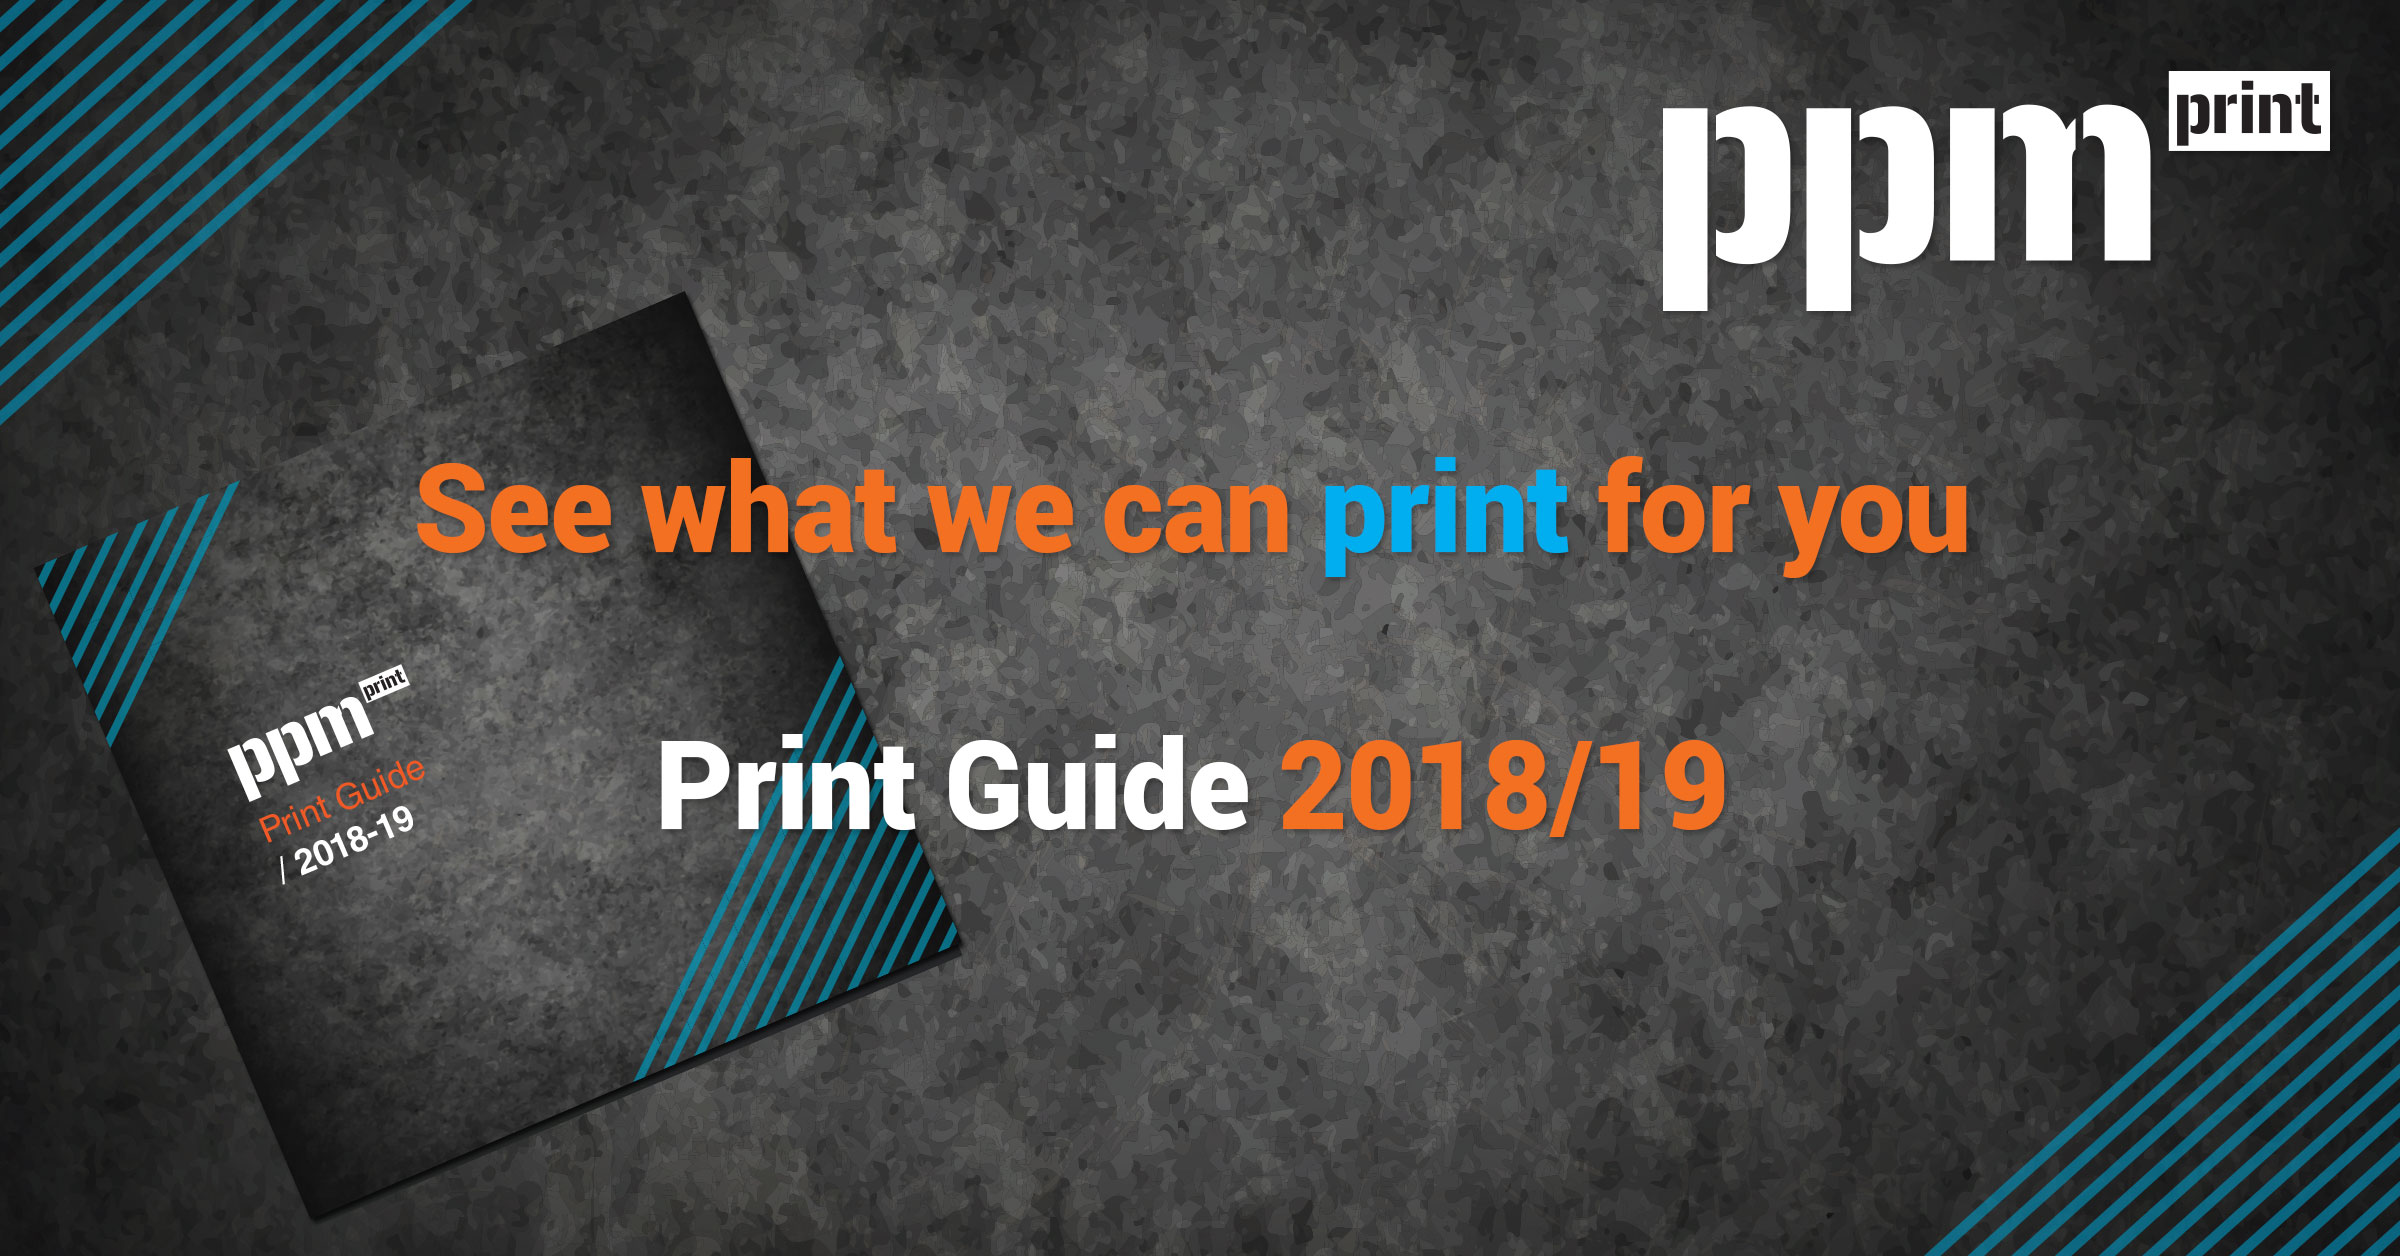 print guide